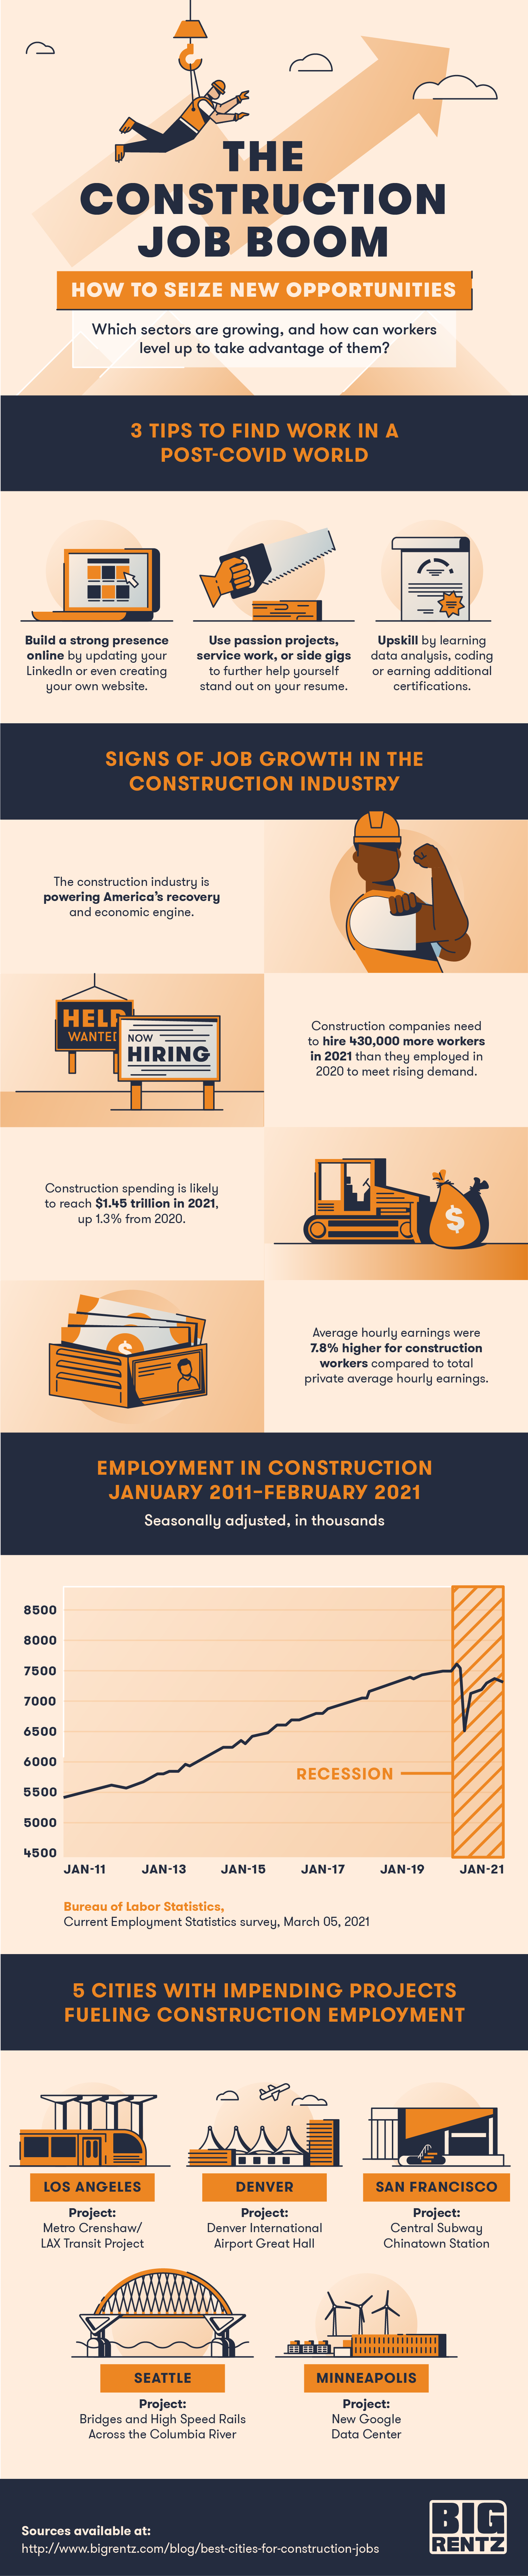 construction job boom infographic